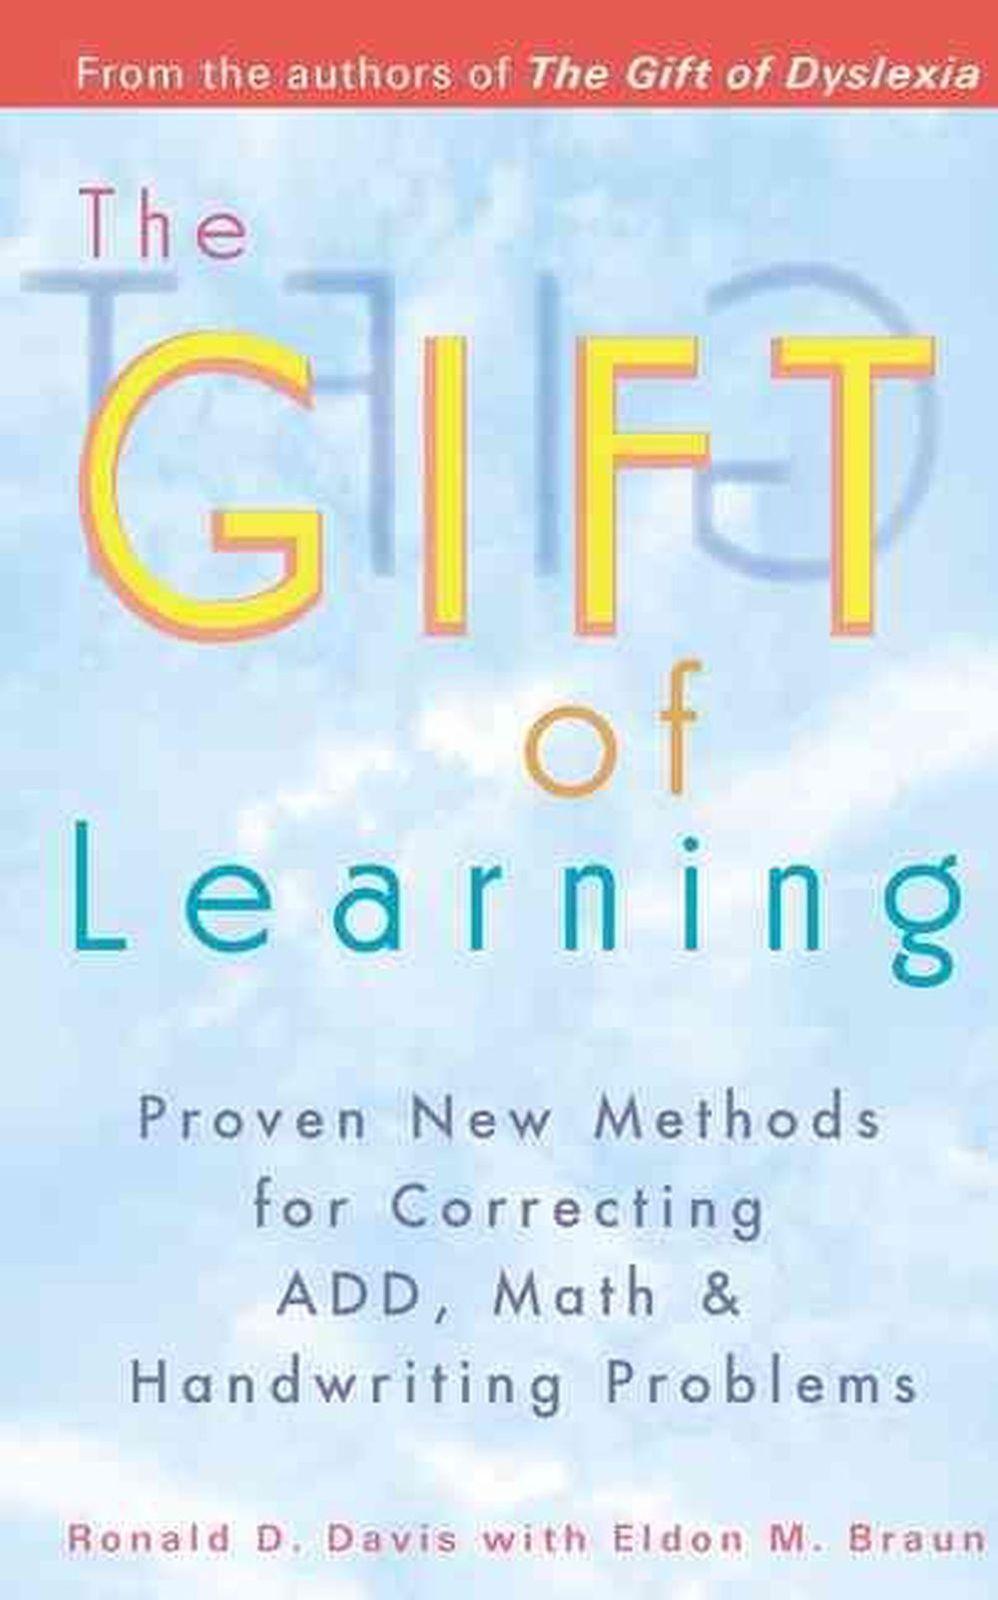 5da1dbe78c530f69c5a2bdc58671130b--kinesthetic-learning-learning-disabilities.jpg